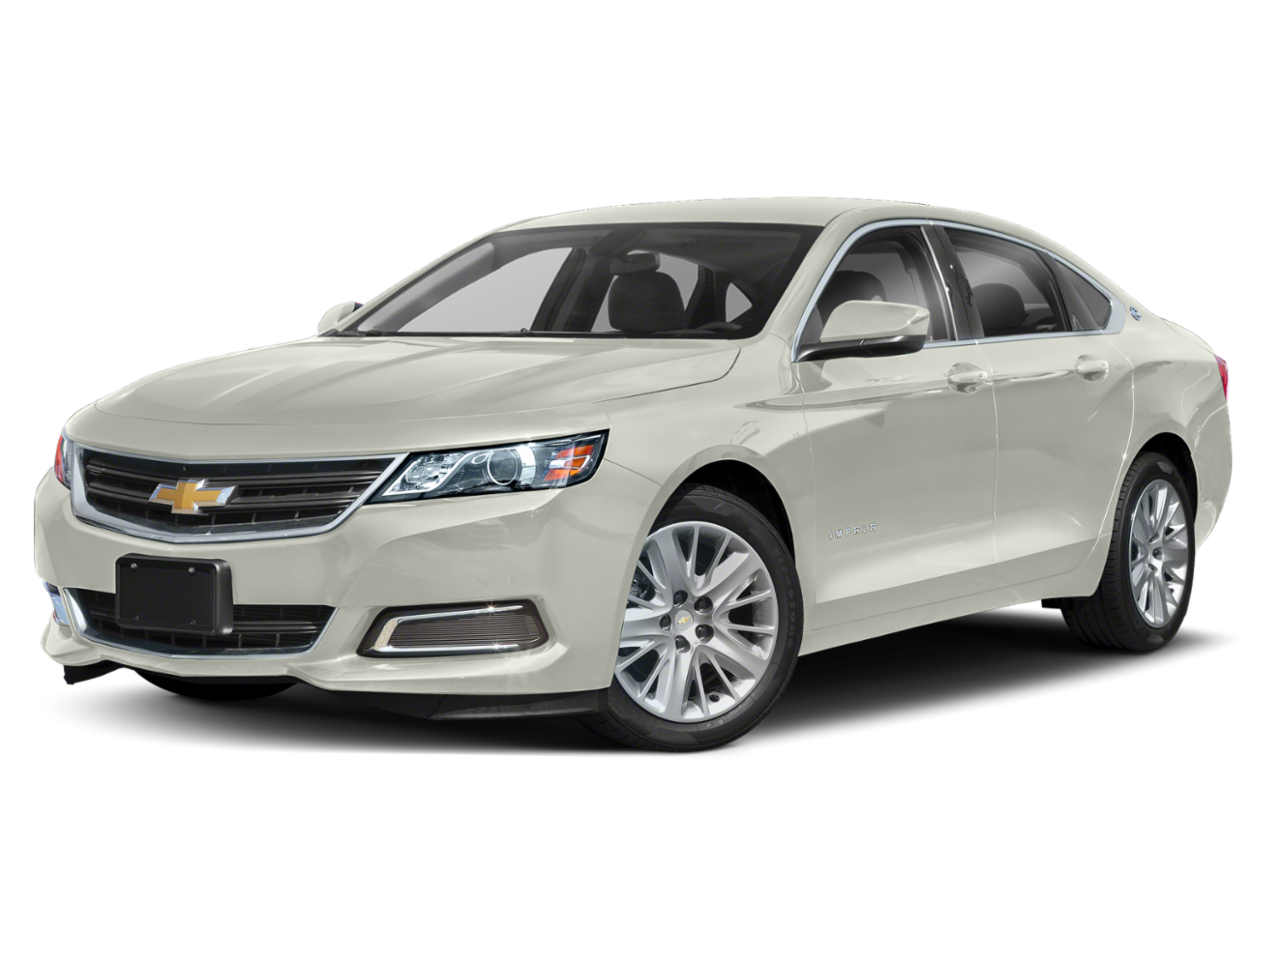 Chevrolet 2020 Impala LT